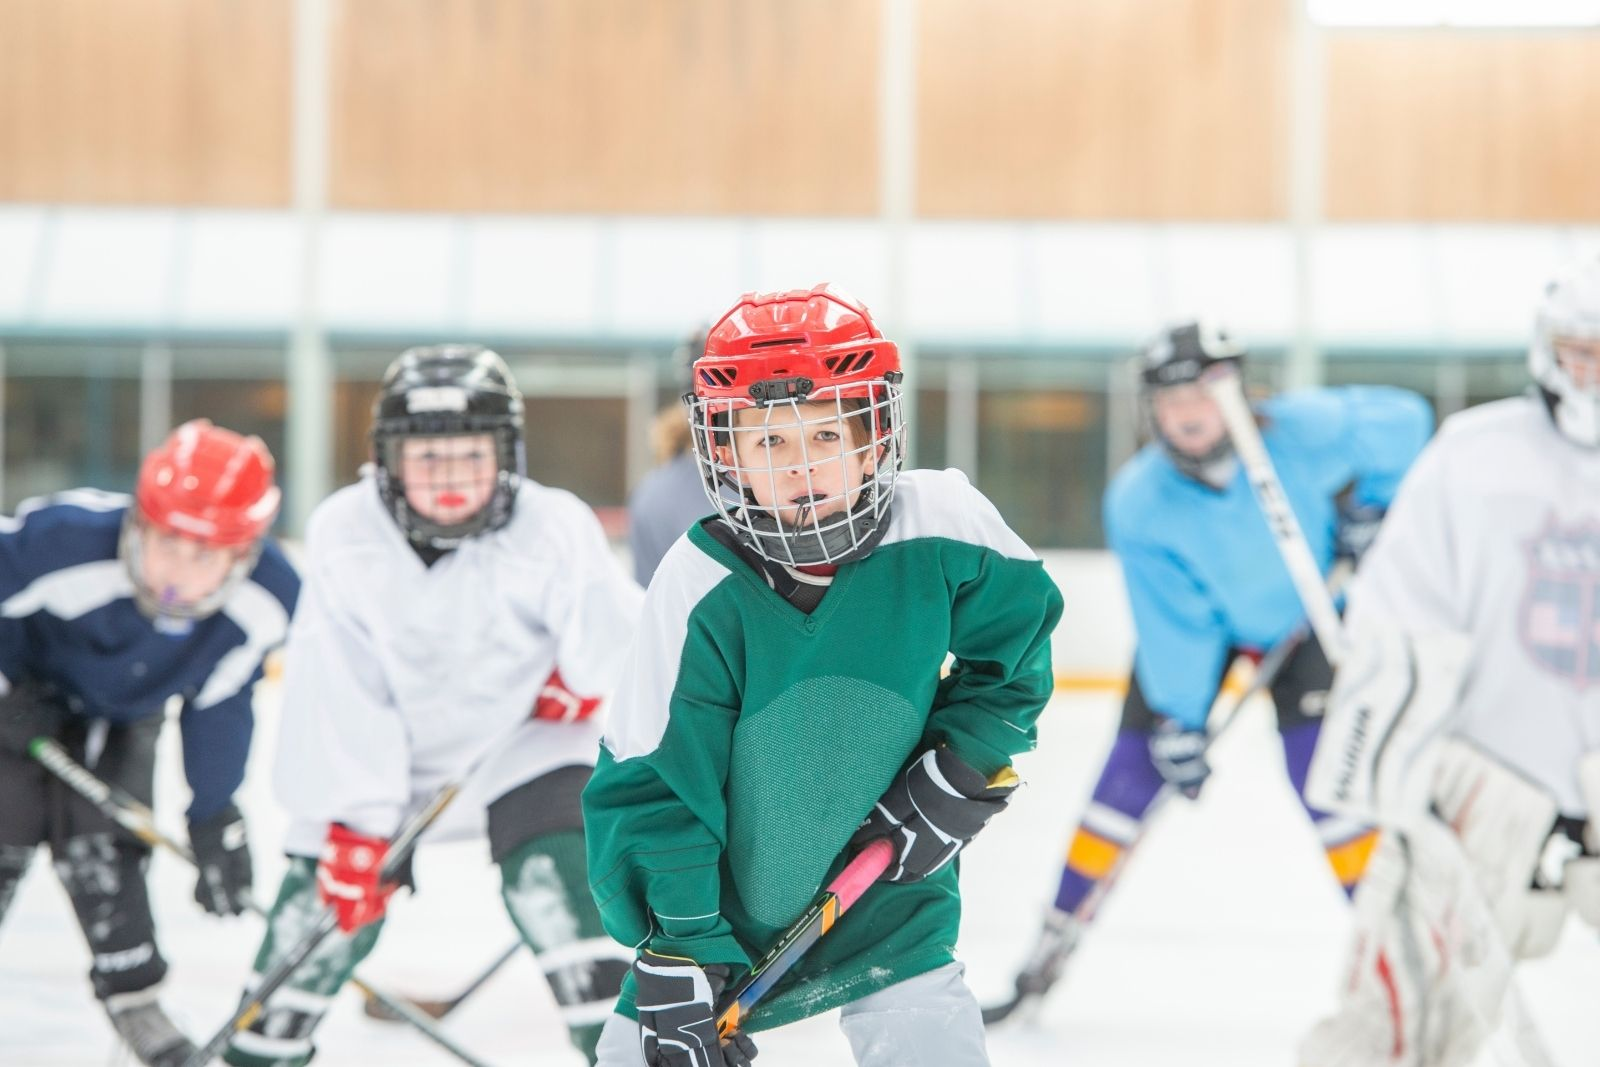 introducing kids to hockey